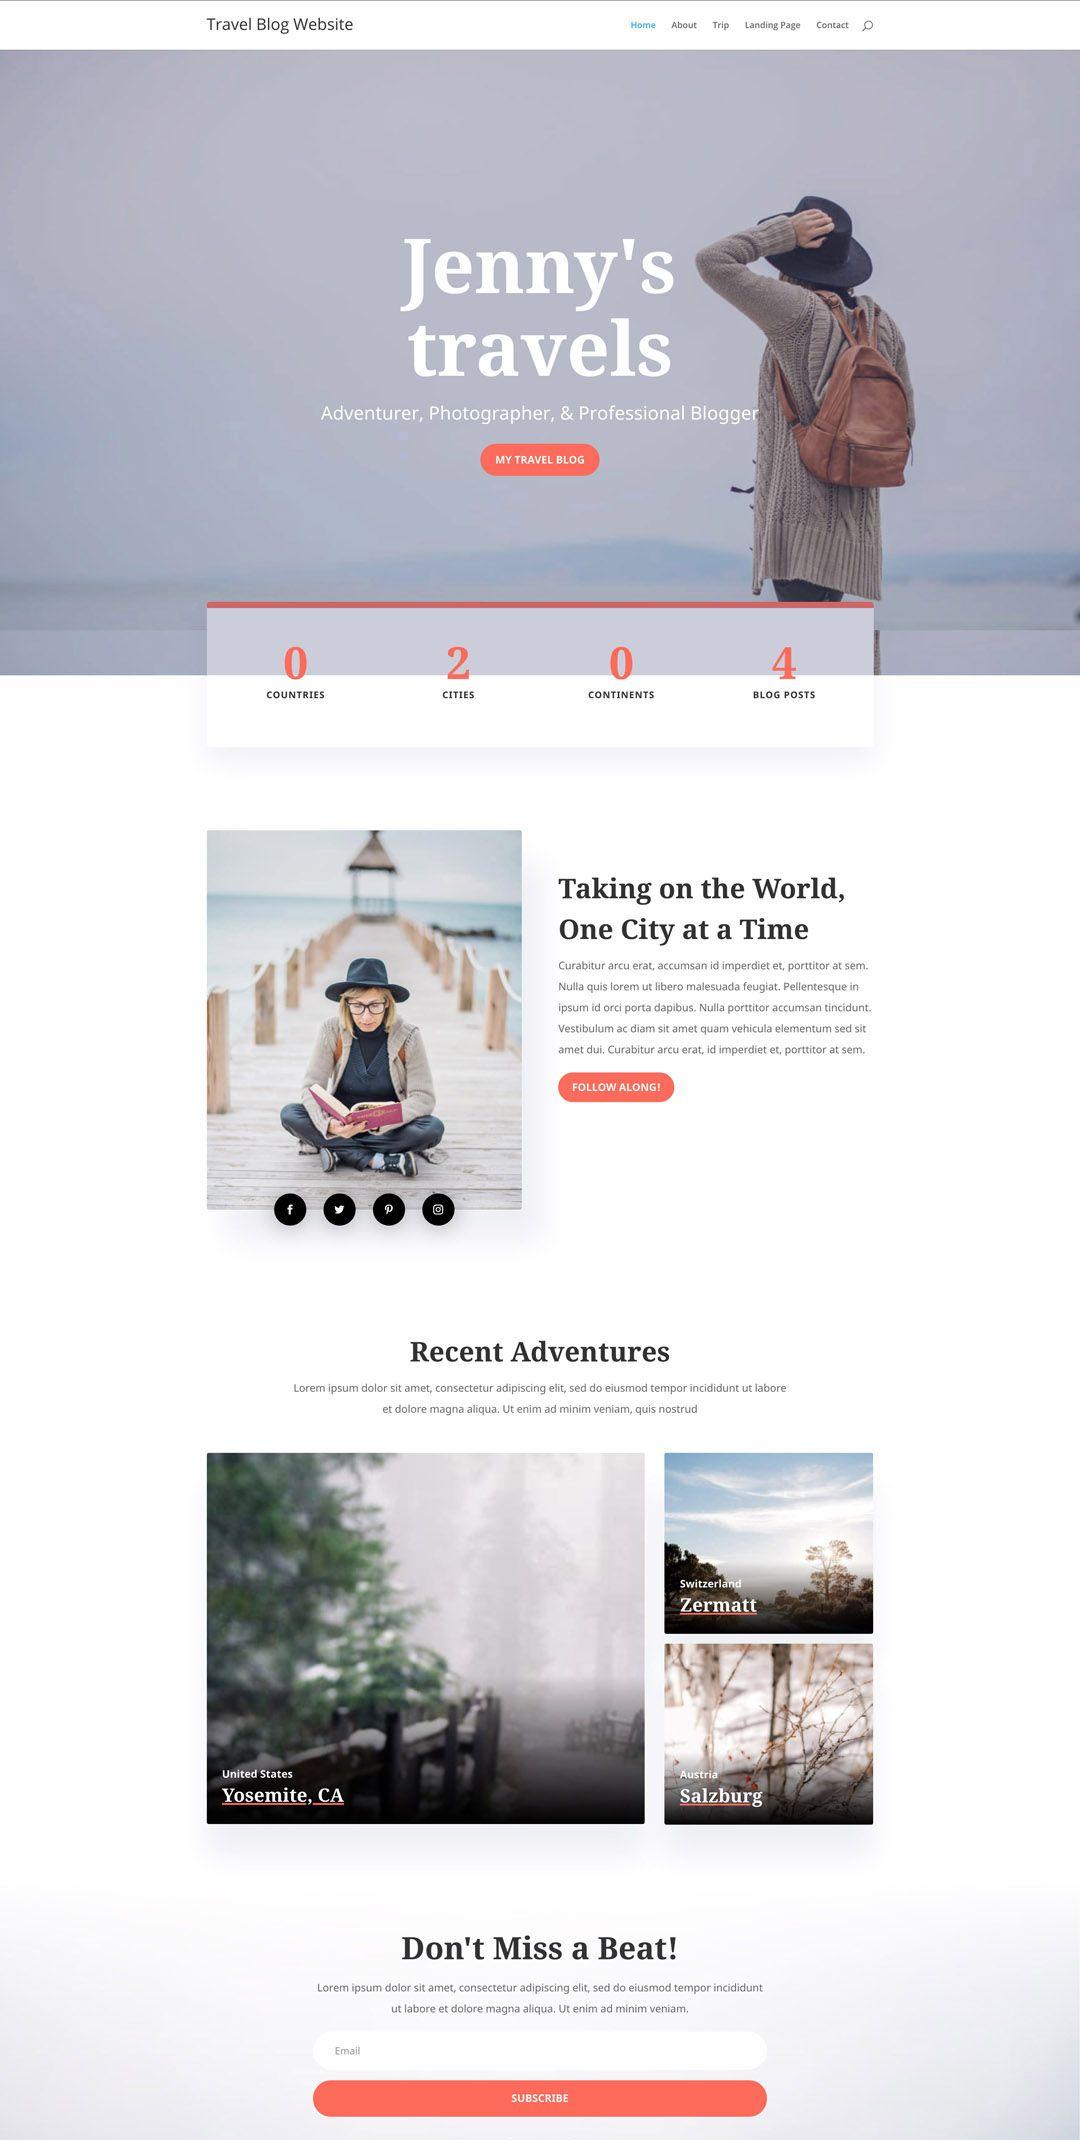 Travel Blogger Website Design Layouts Travel Website Design Travel Blog Design Website Design Layout